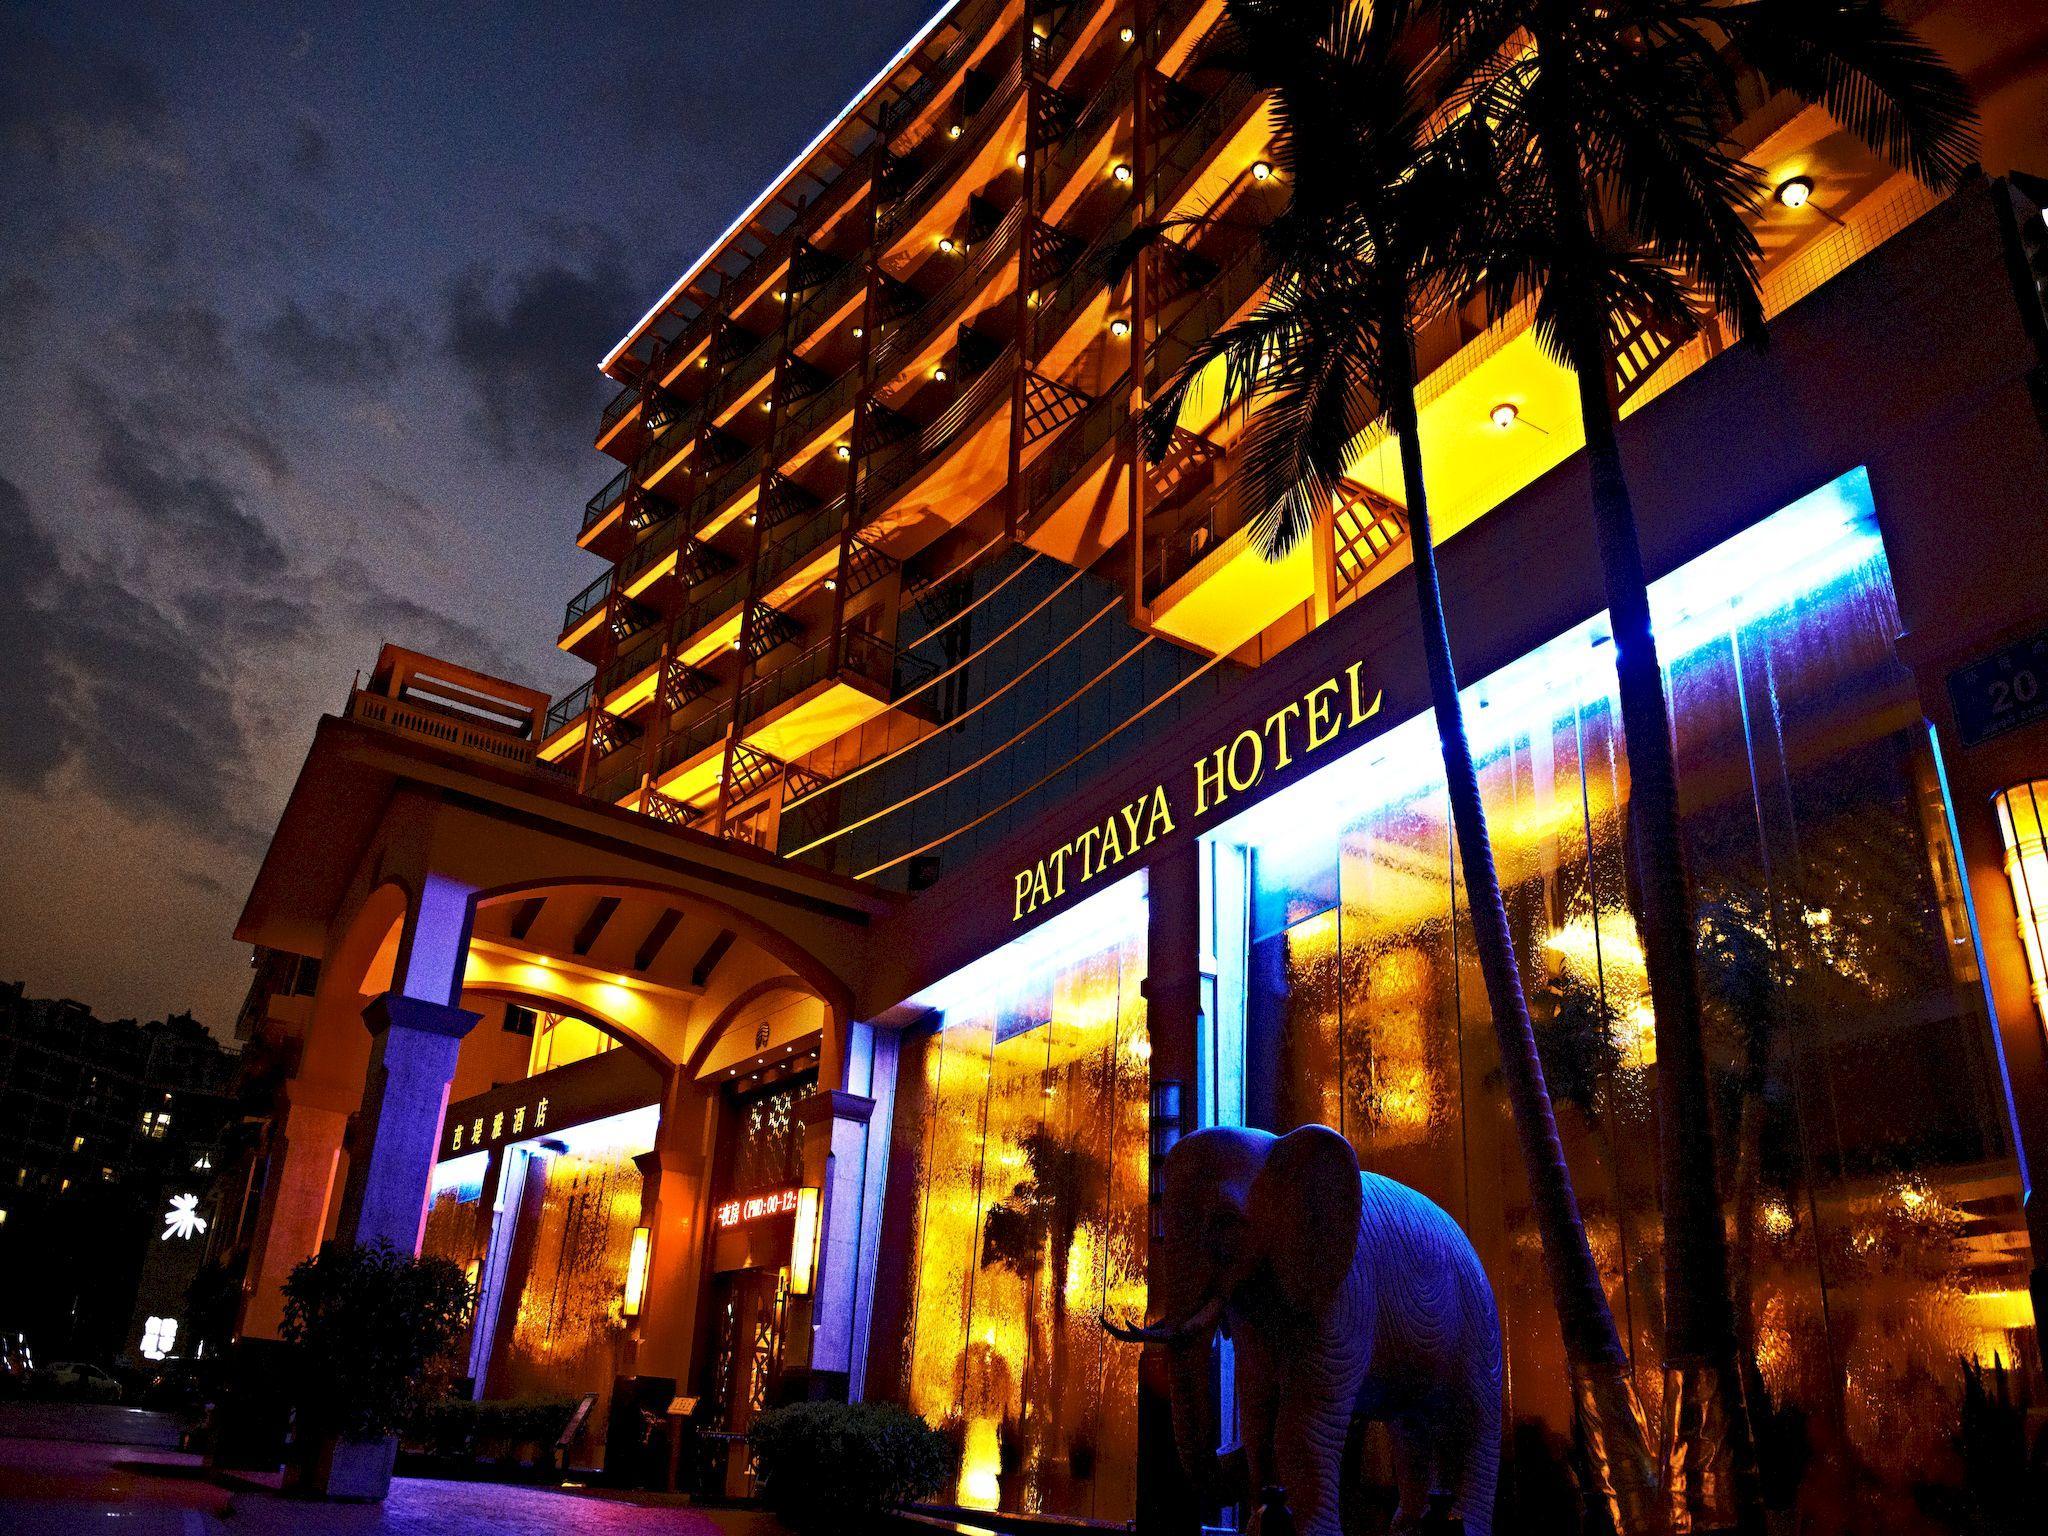 Pattaya Hotel Appartment